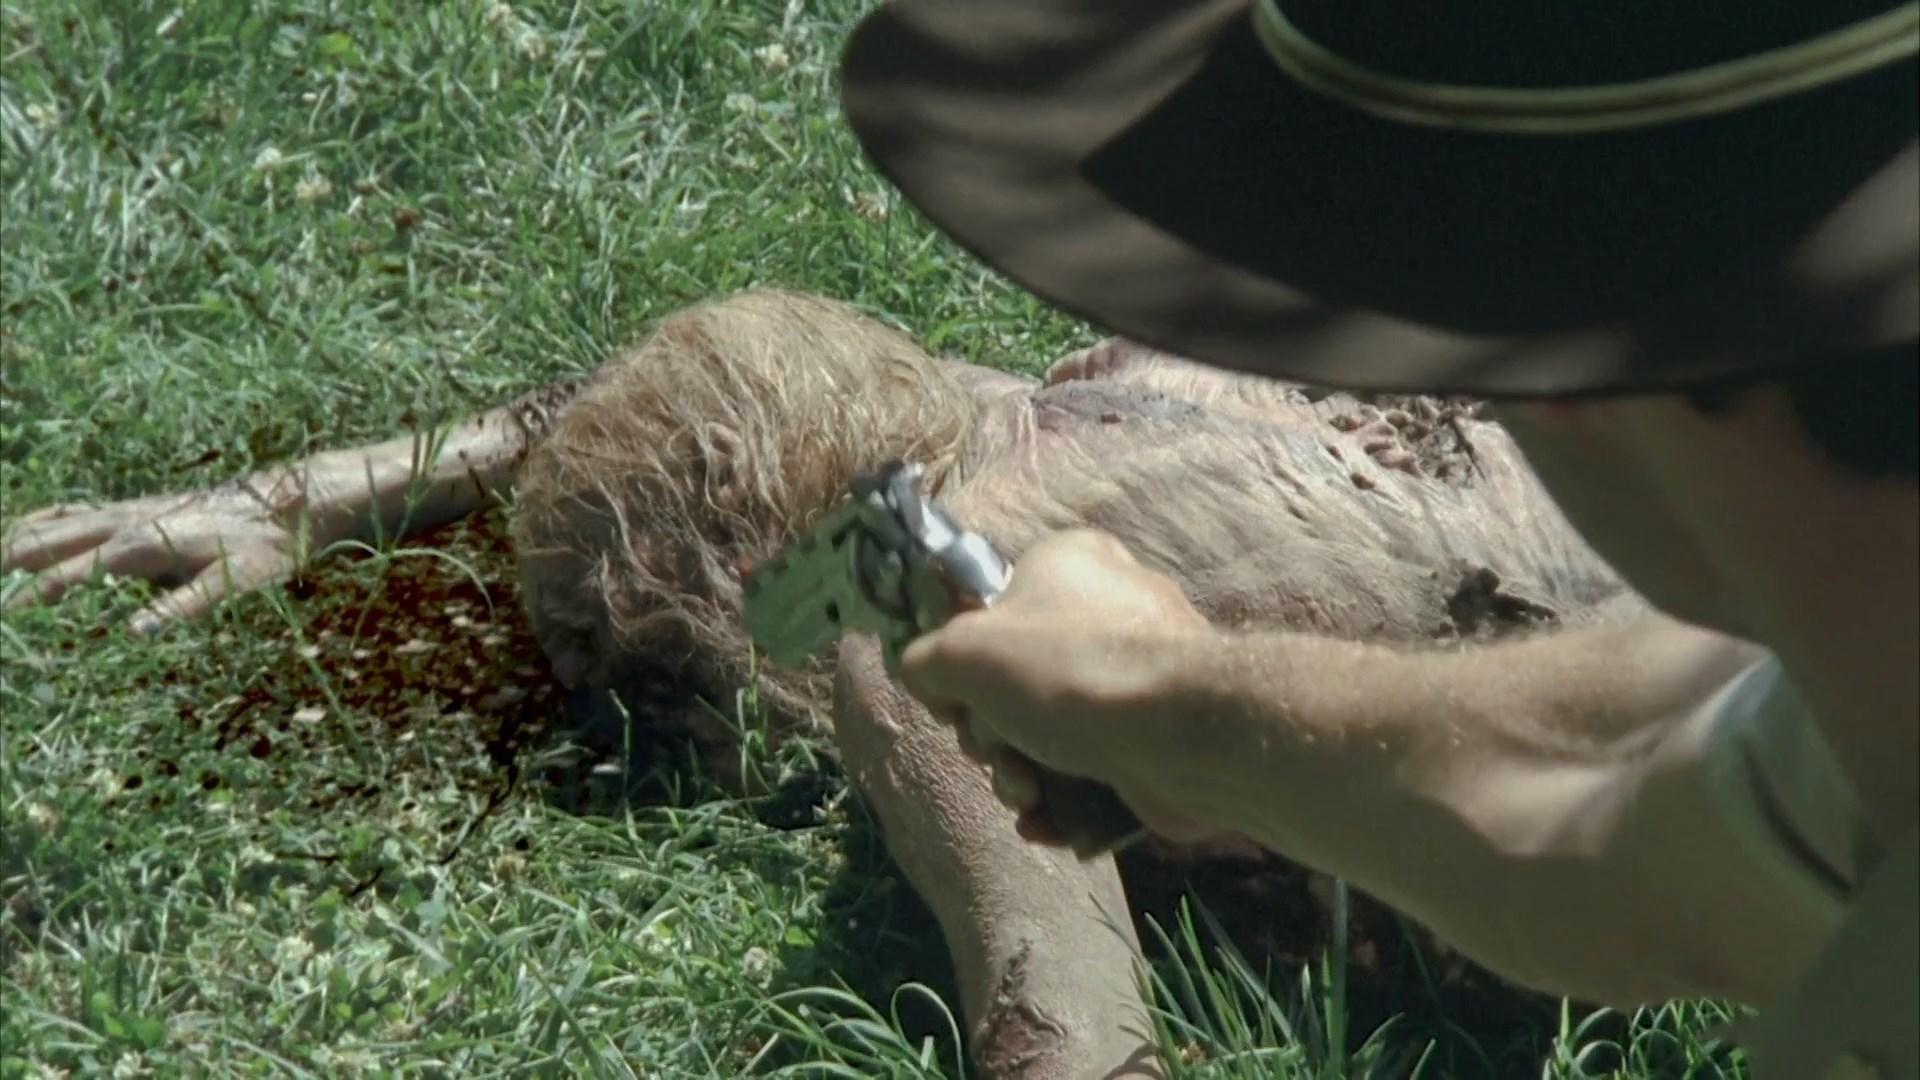 The Walking Dead S03 1080p NF WEB-DL DUAL DD+5.1 H.264 Türkçe Dublaj